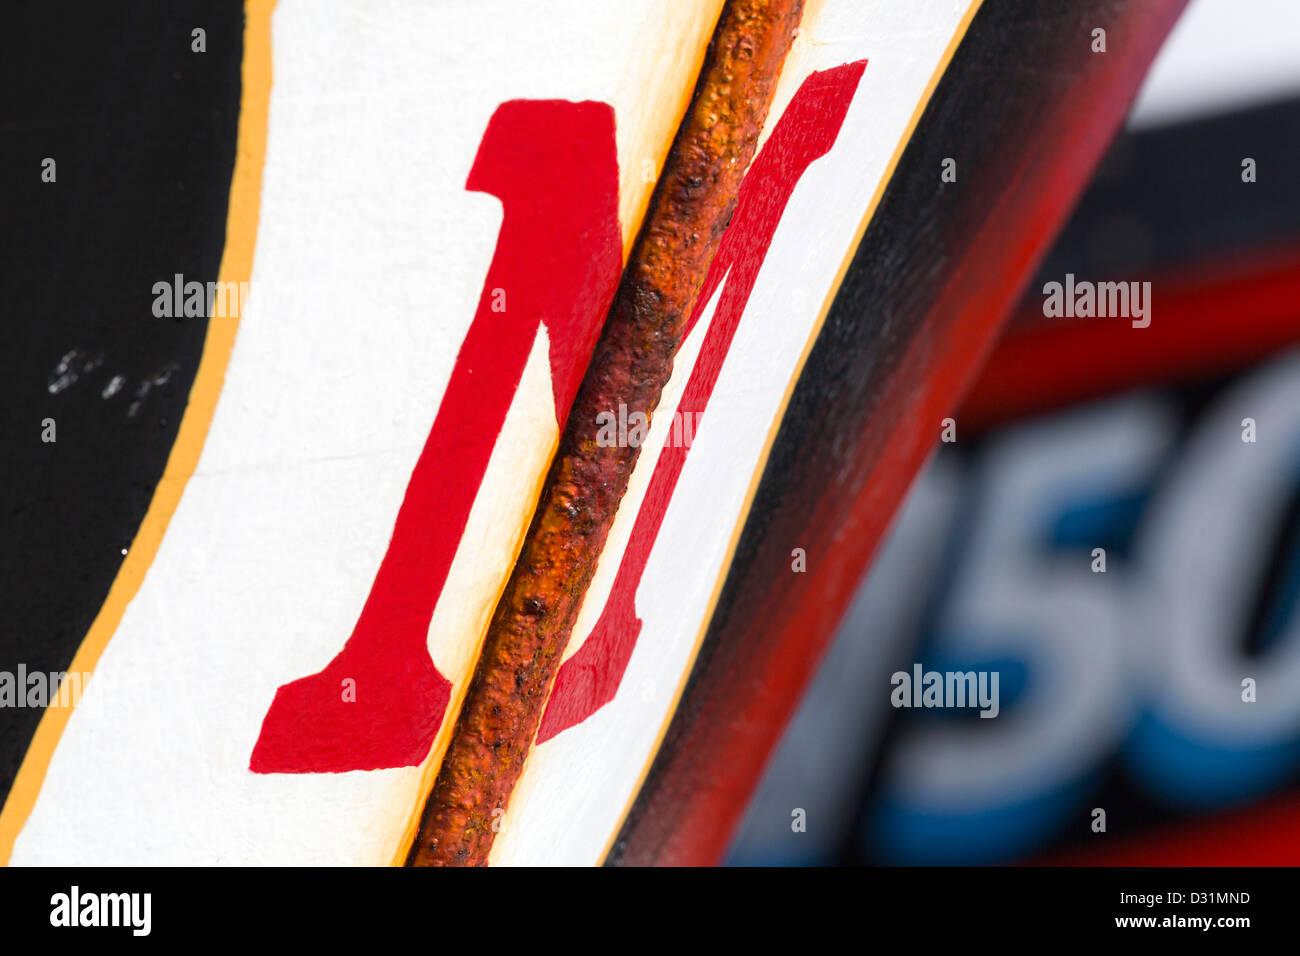 Rost-rot M; Symmetrie; Angeln-Boot-Ausschnitt; Stockbild